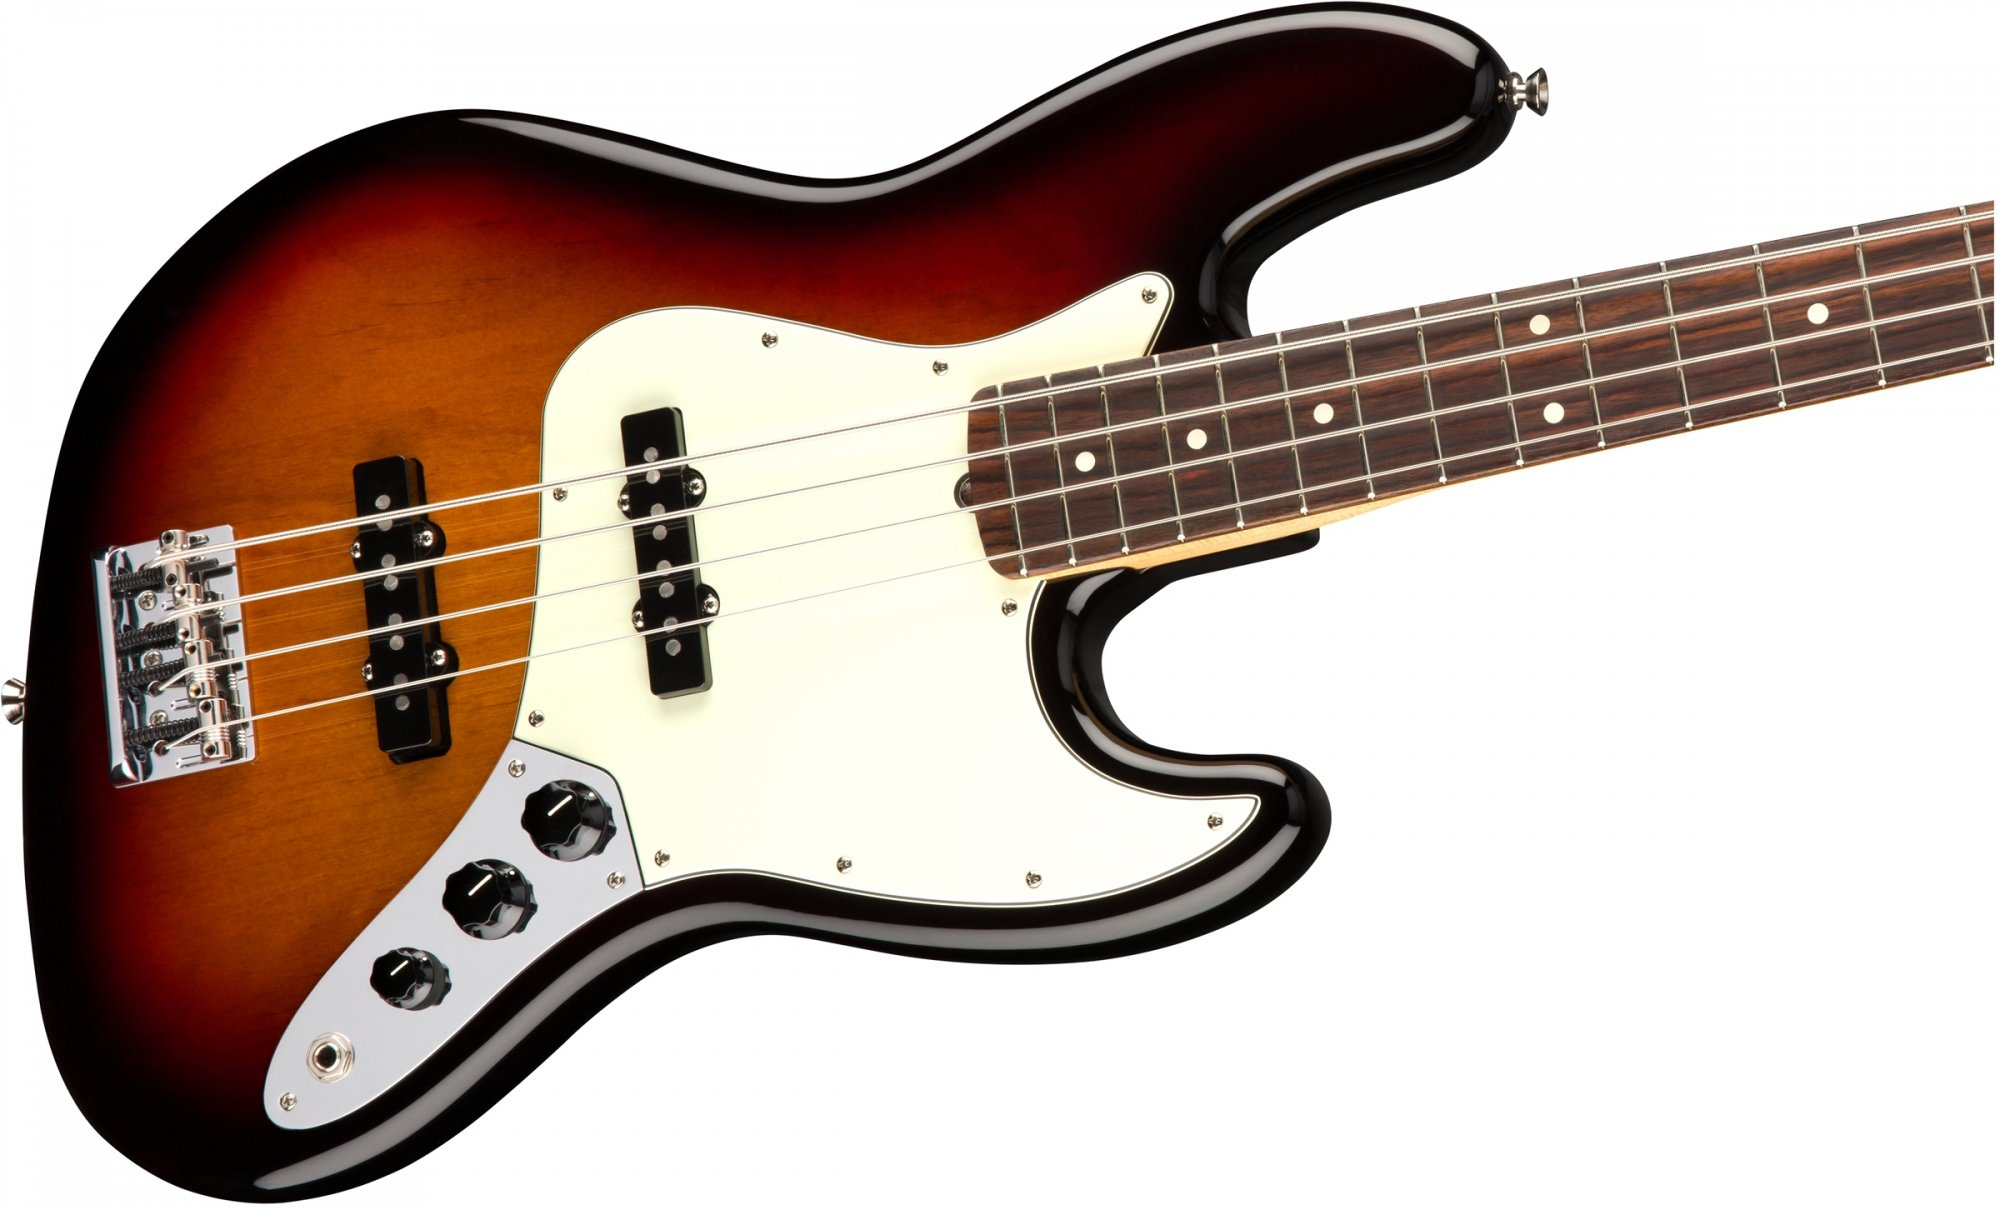 Fender American Professional Jazz Bass 3-Tone Sunburst